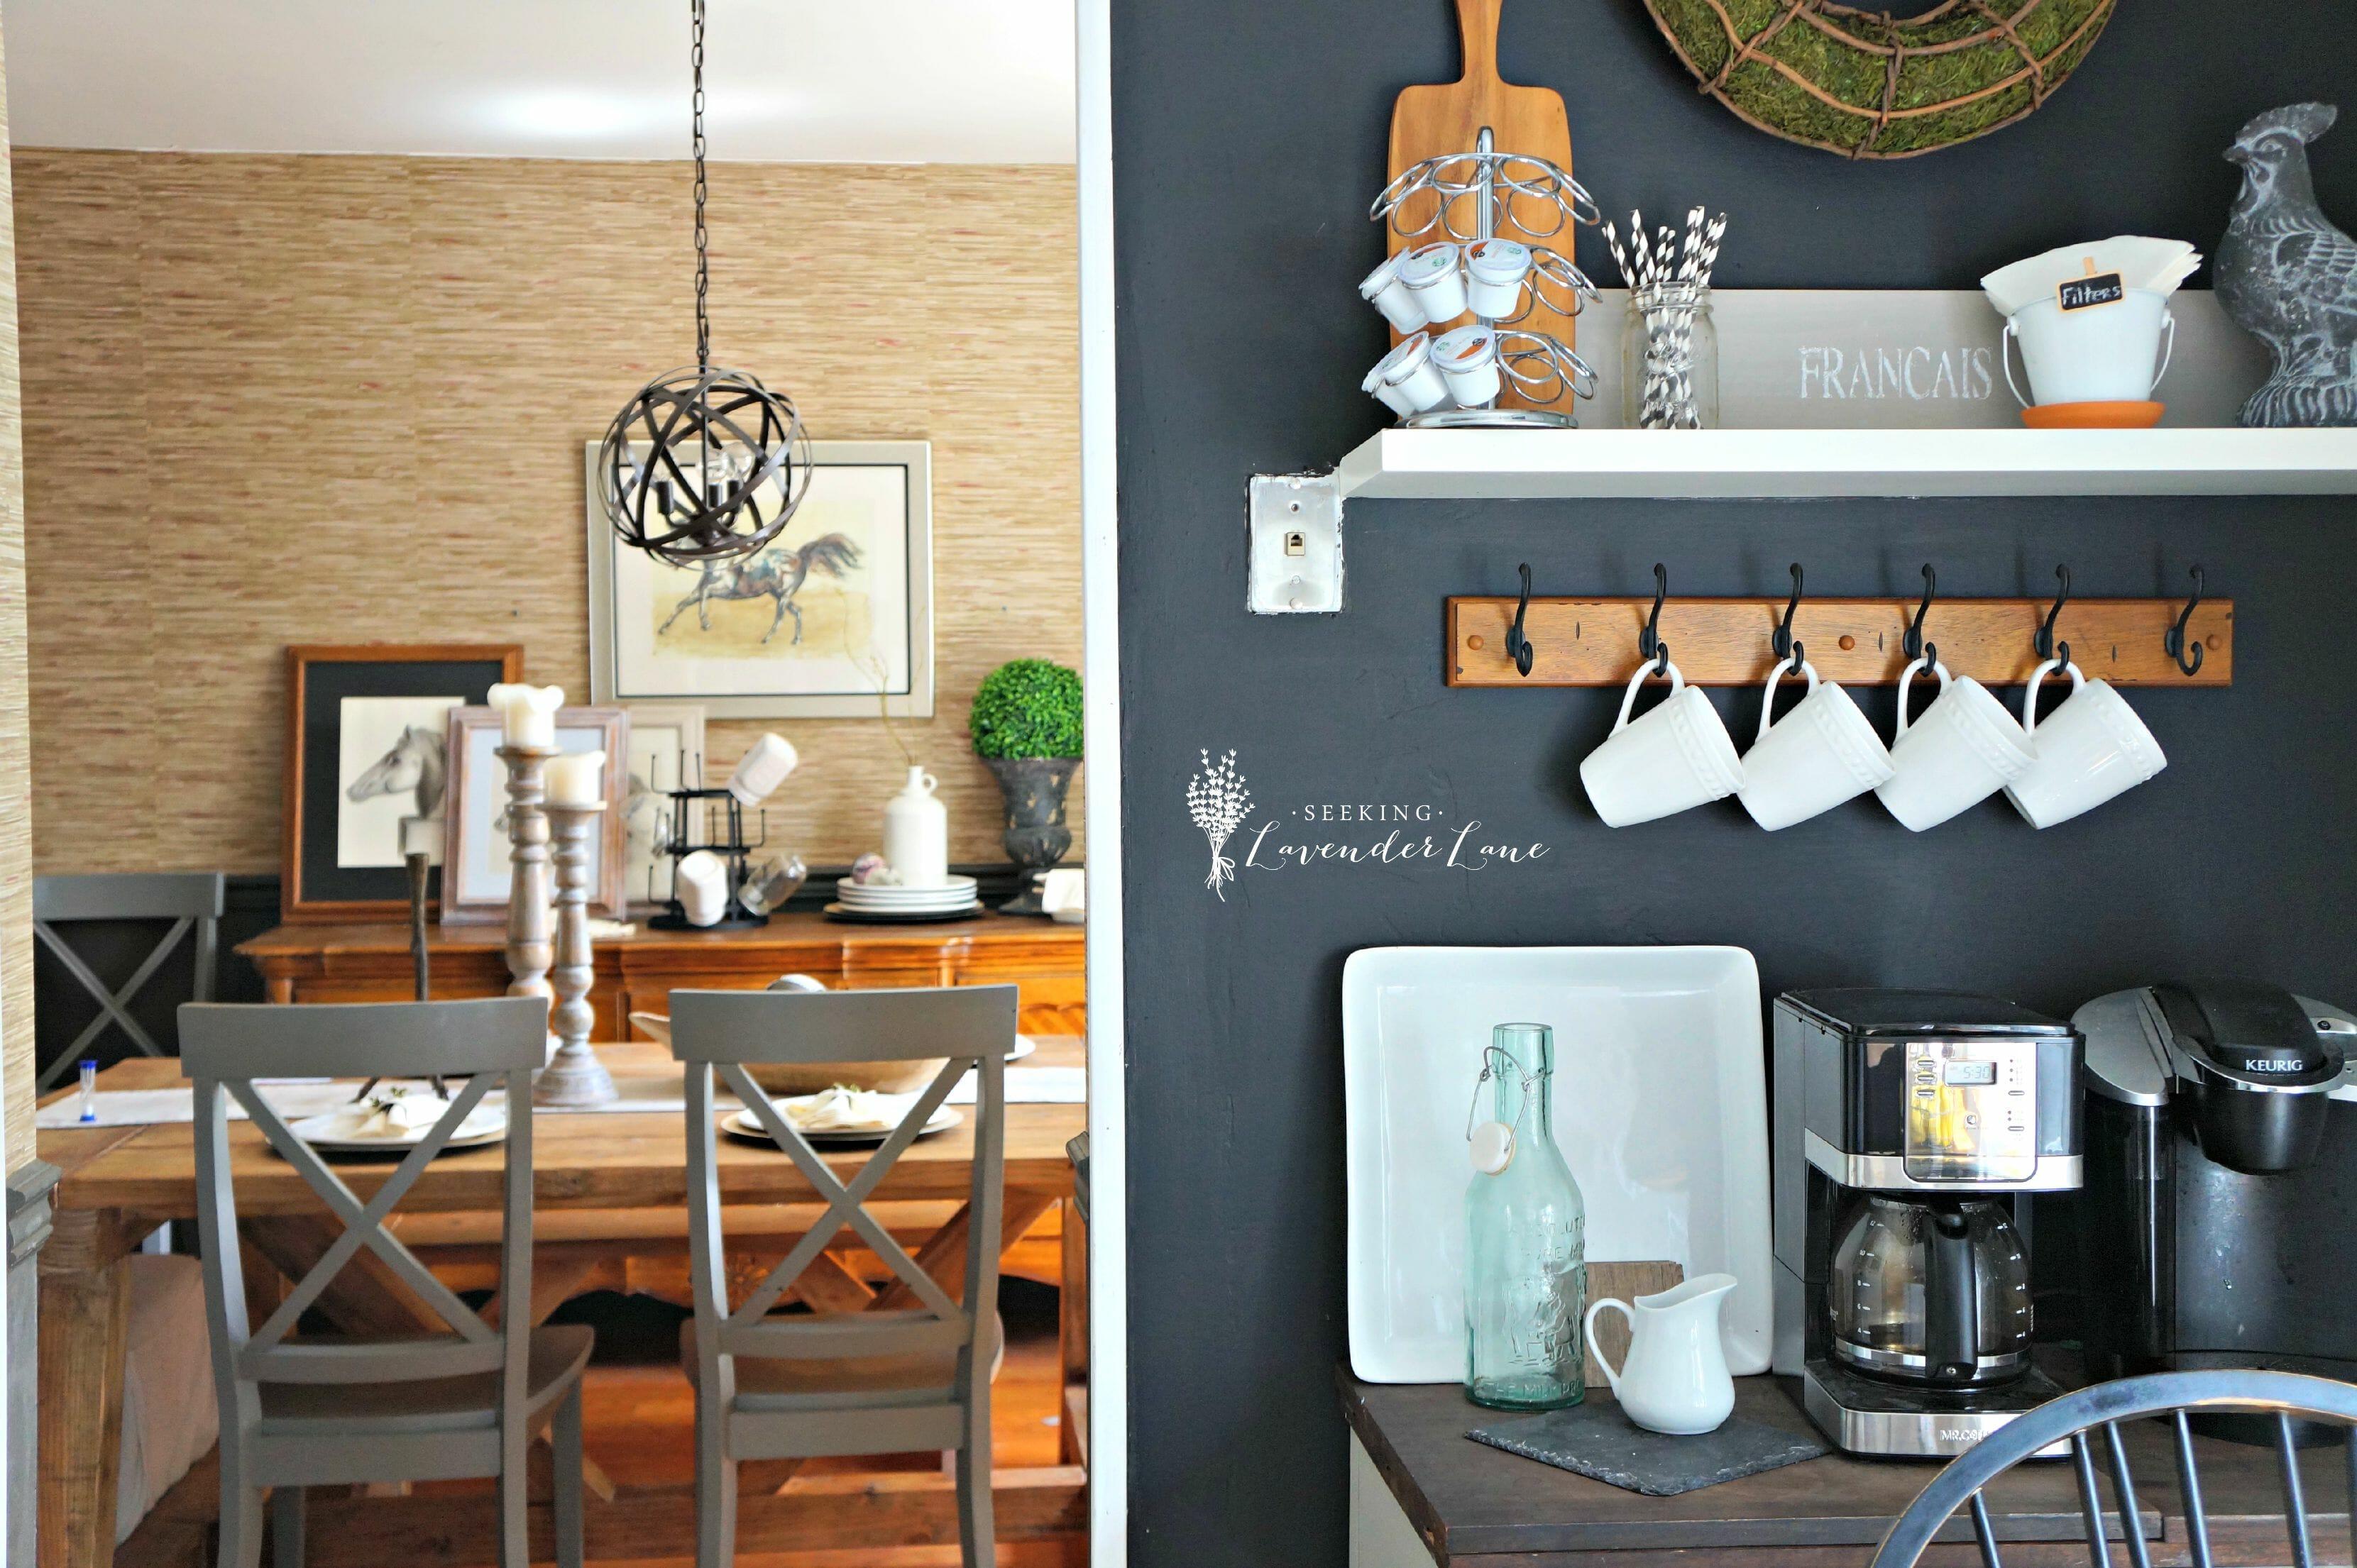 Adding Drama With A Chalkboard Wall Rh Seekinglavenderlane Com Chalkboard  Accent Wall In Kitchen How To